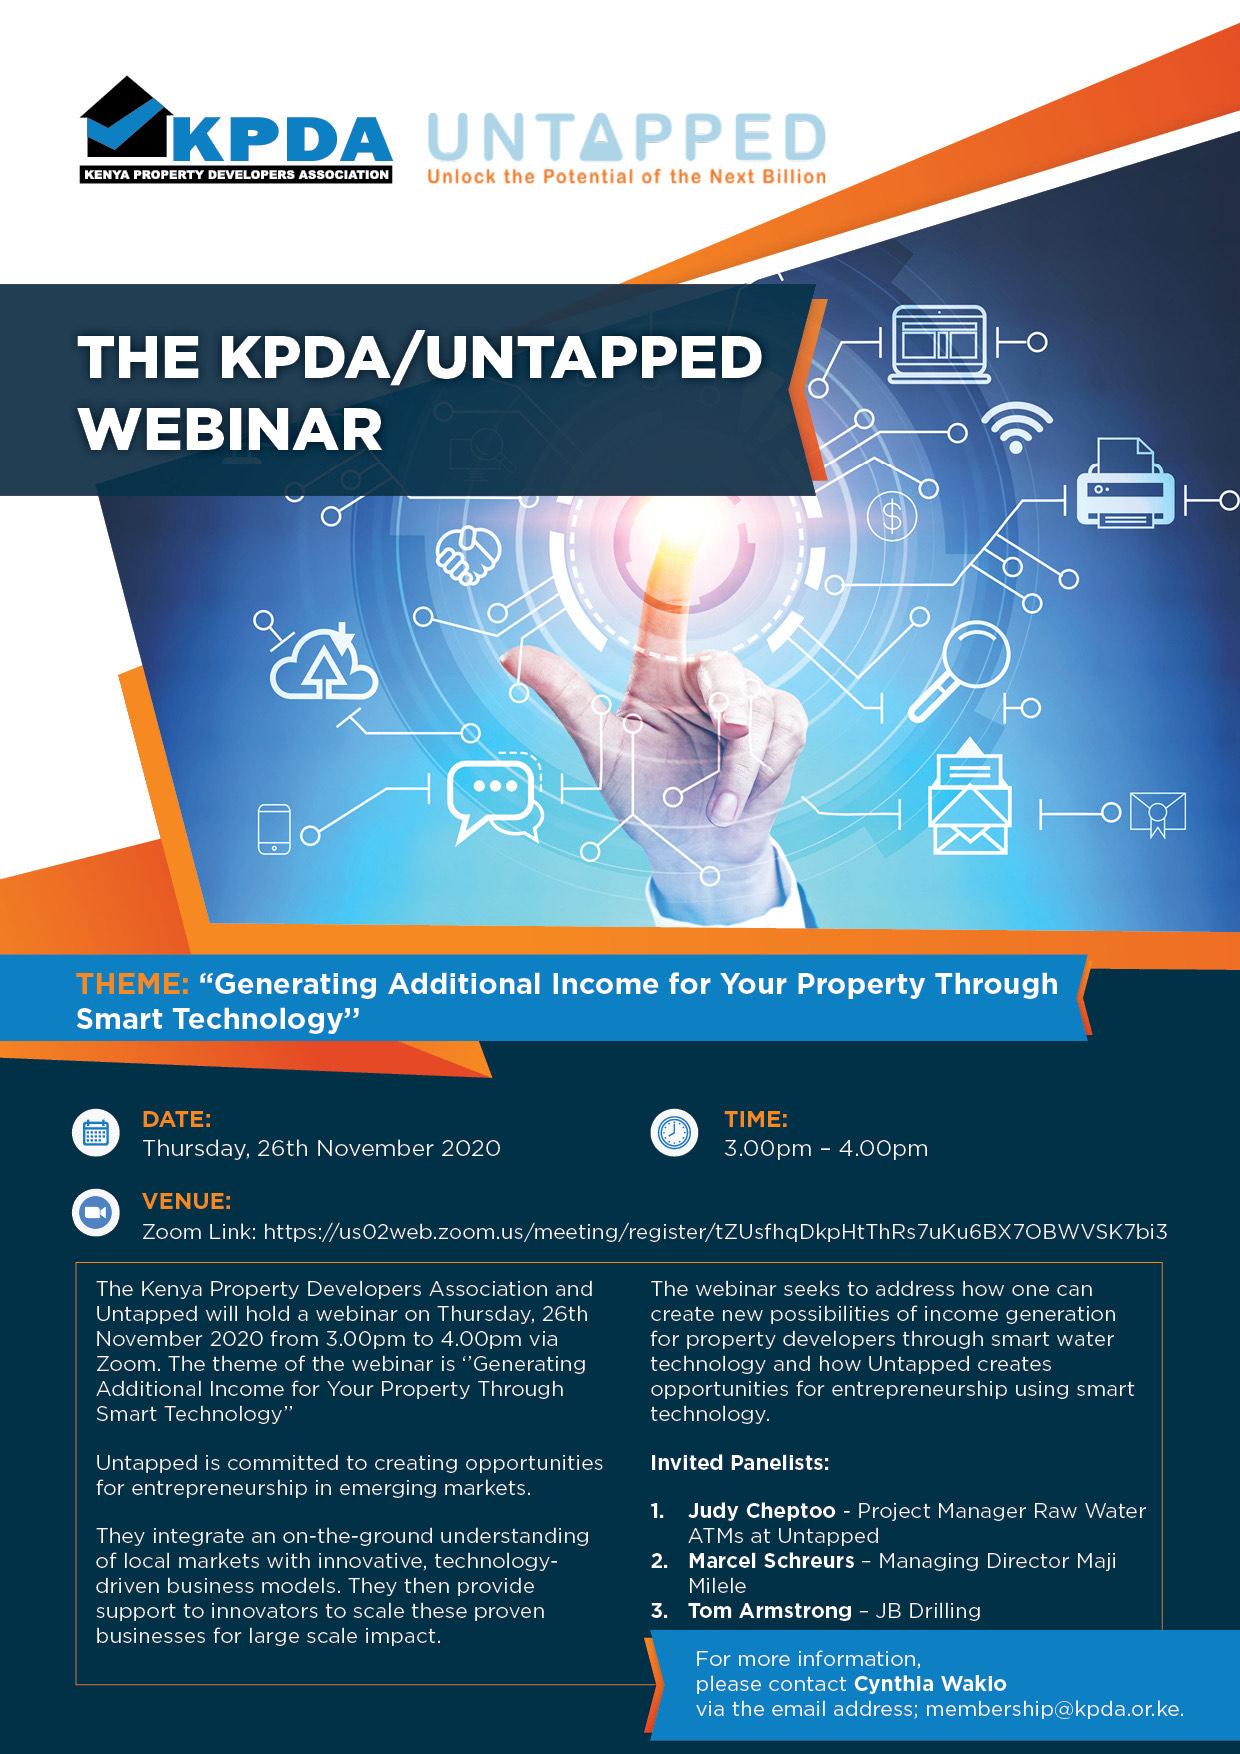 Invitation to the KPDA UNTAPPED Webinar, Thursday, 26th November 2020